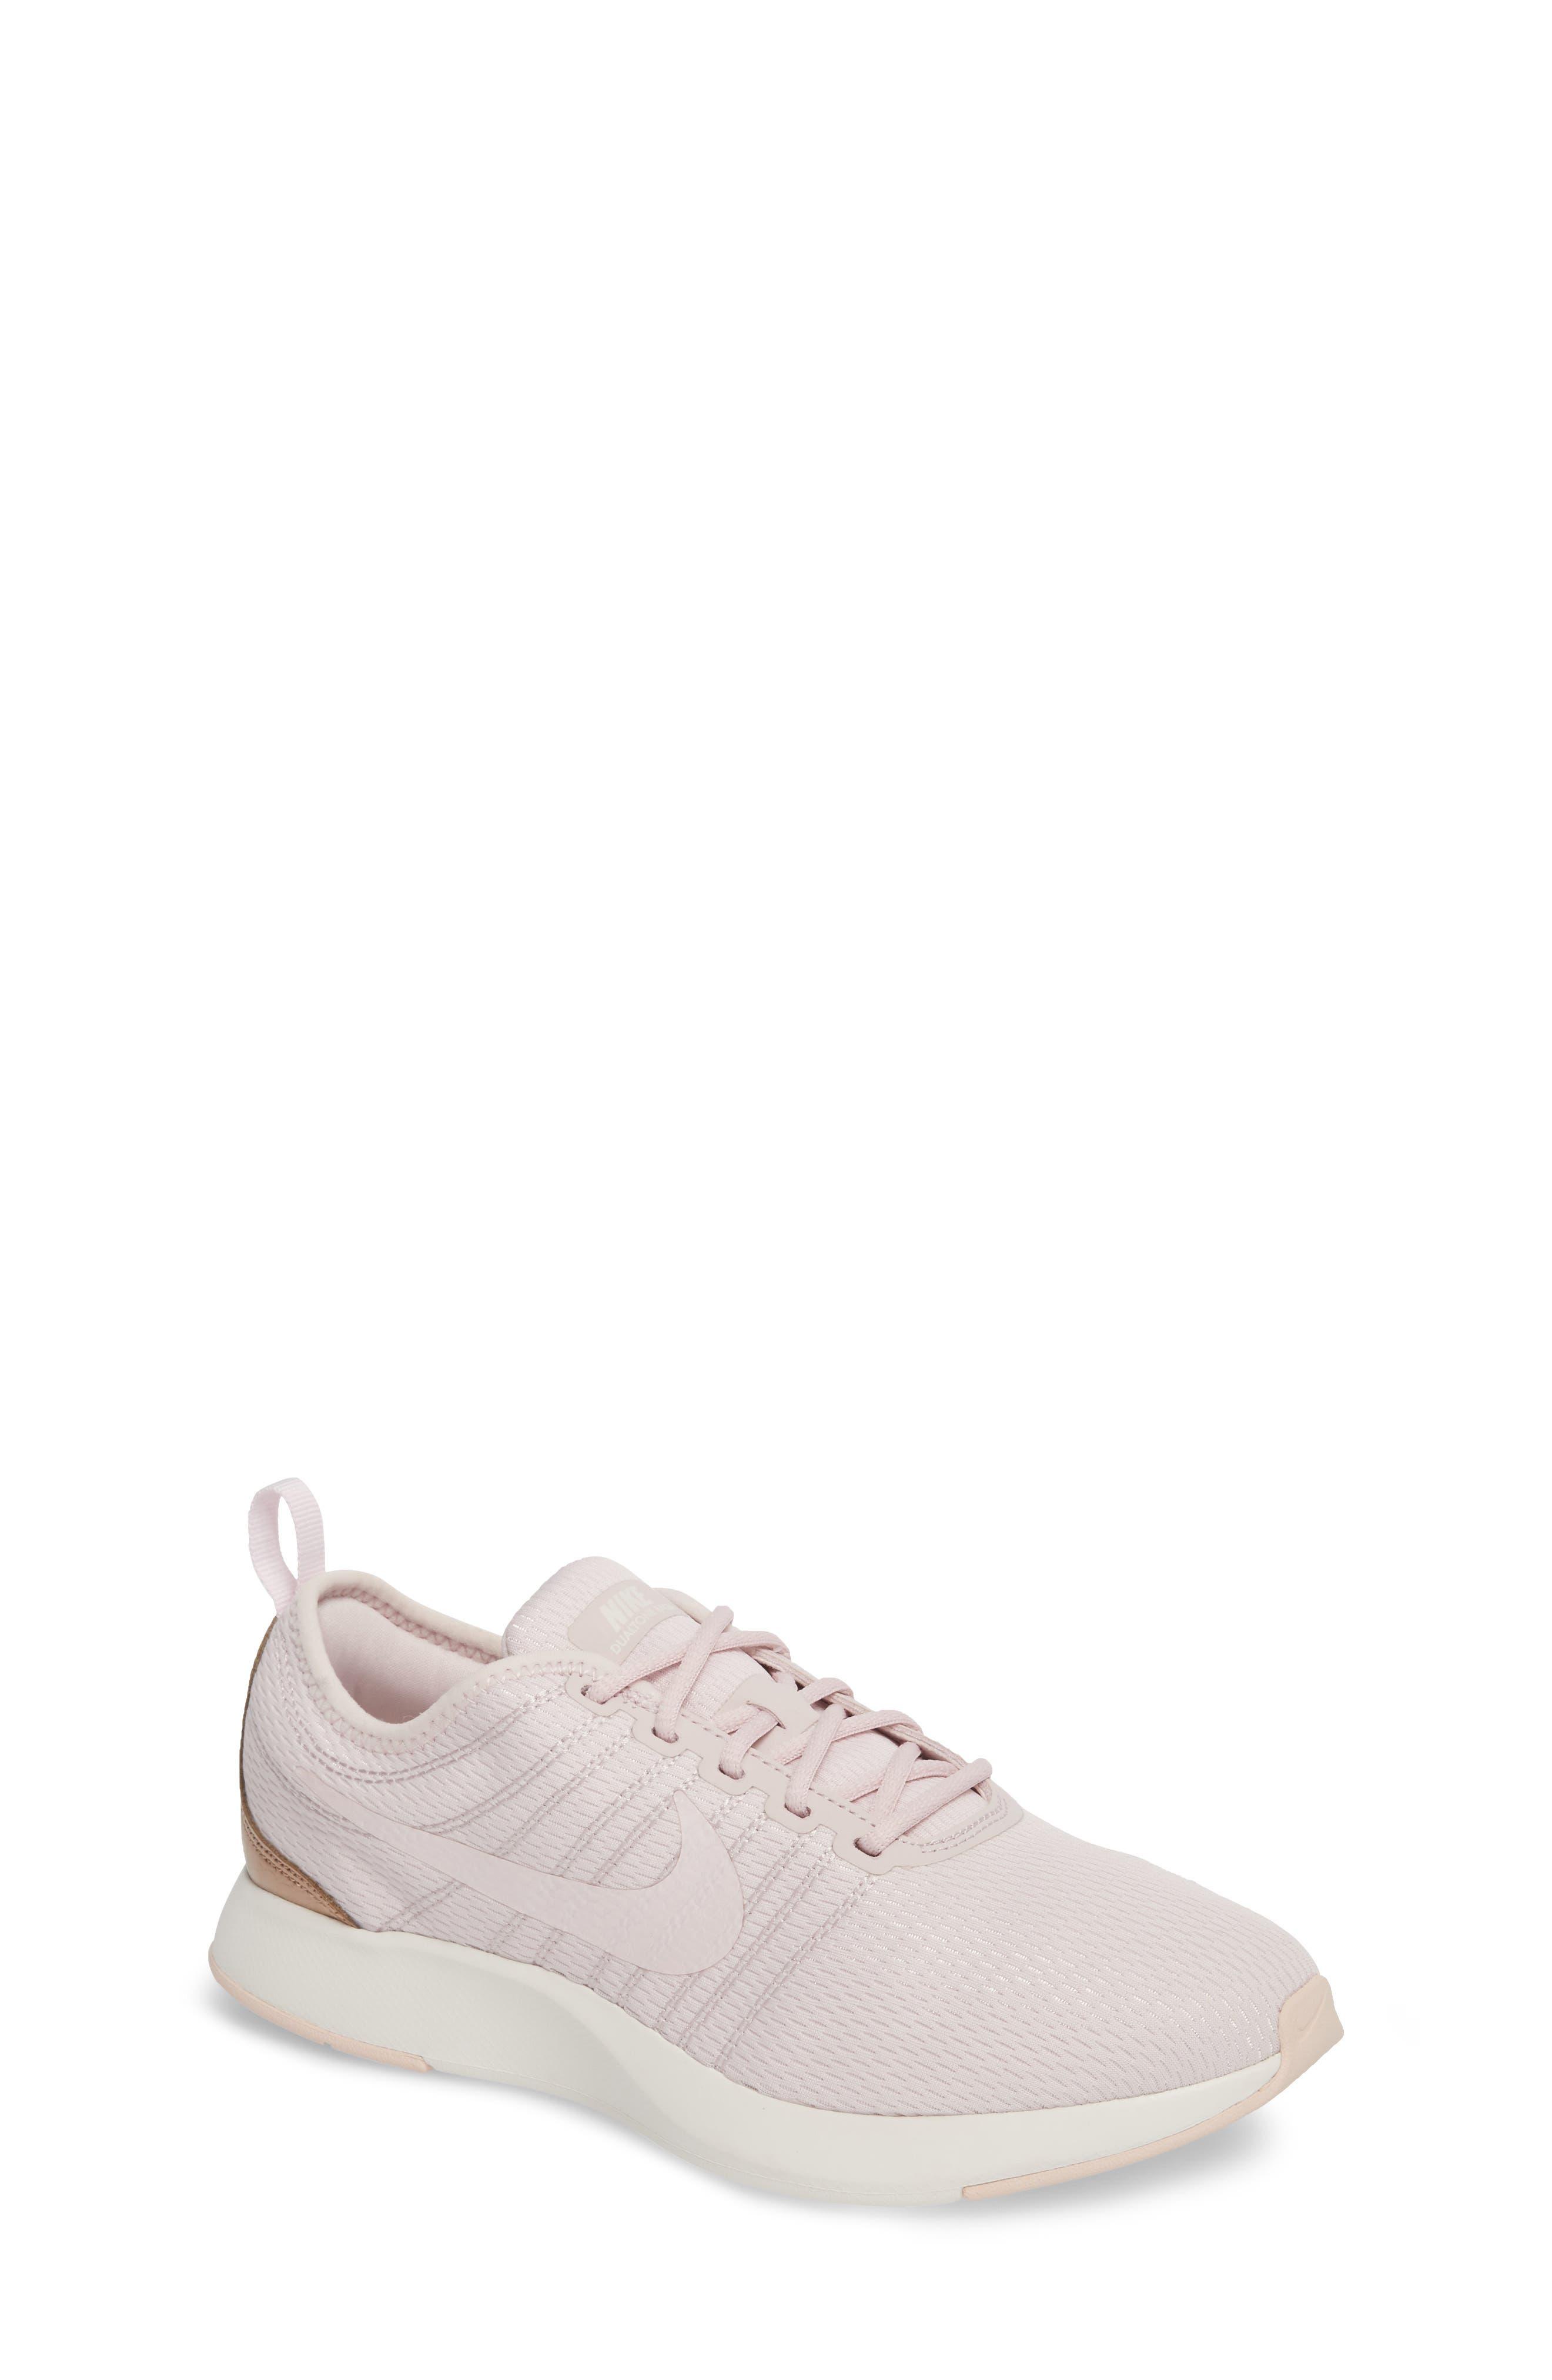 Dualtone Racer GS Sneaker,                             Main thumbnail 2, color,